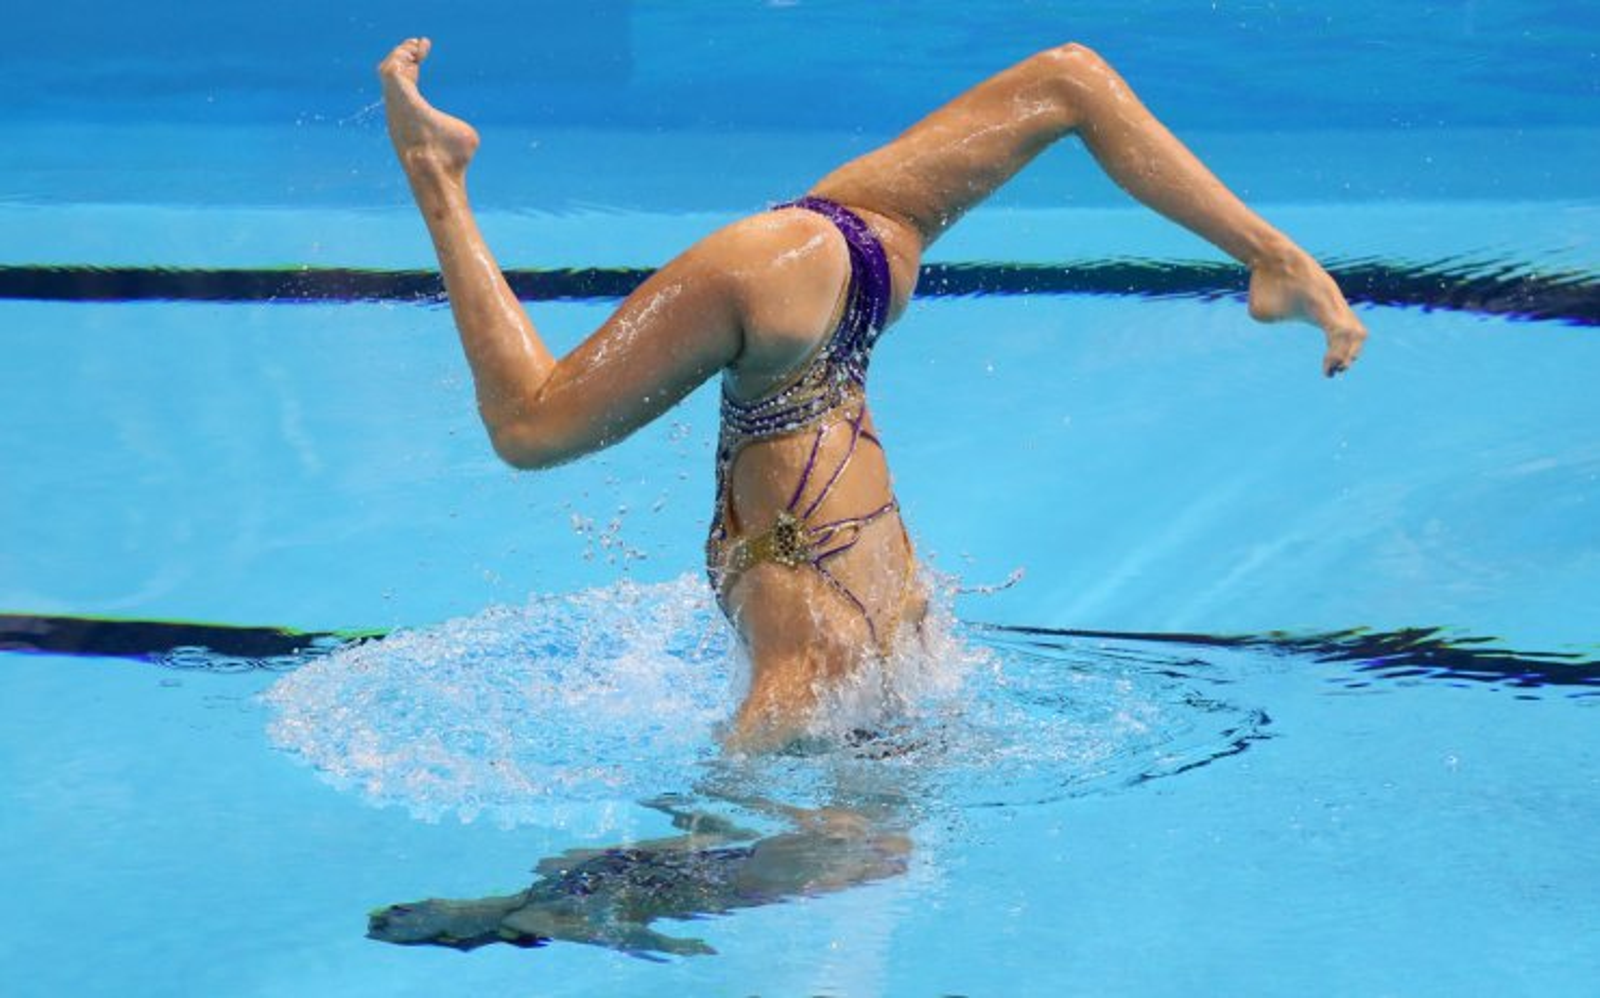 <span>Austria's Anna-Maria Alexandri and Eirini Alexandri perform their routine women's duet technical final at the World Swimming Championships in Gwangju, South Korea, Tuesday, July 16, 2019. Reuters</span><br /><br />